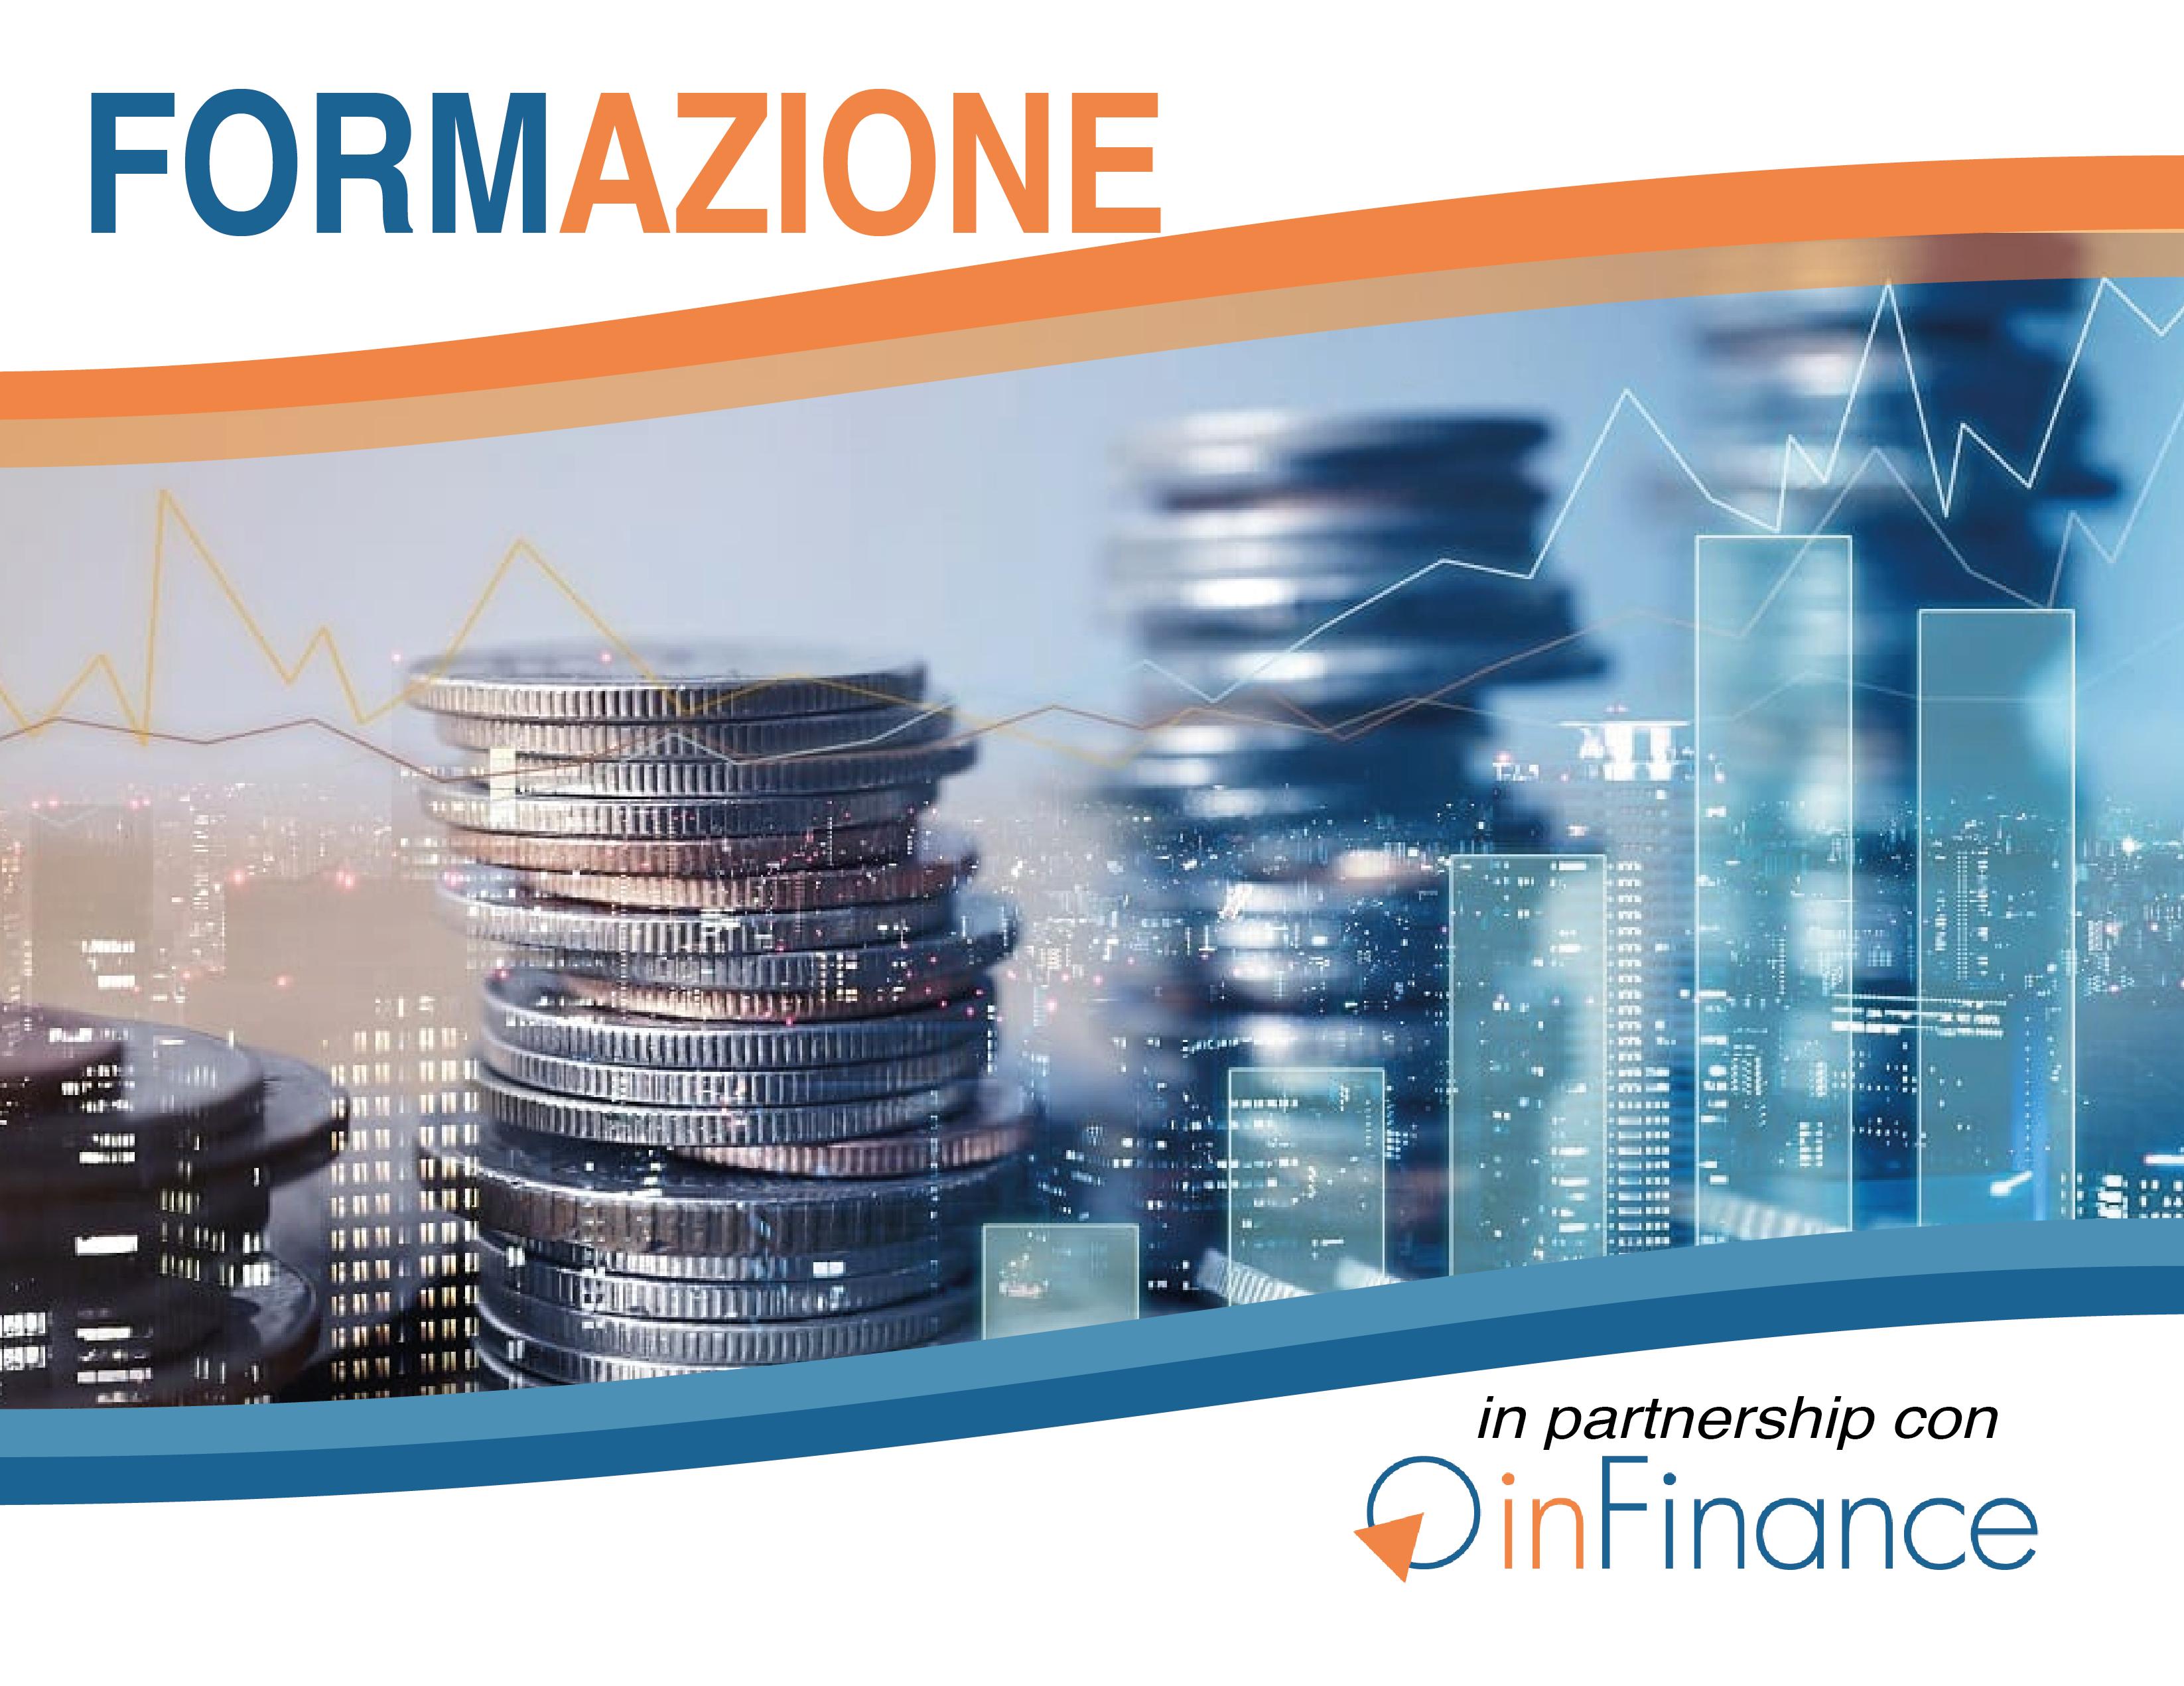 Master inFinance in Corporate Finance